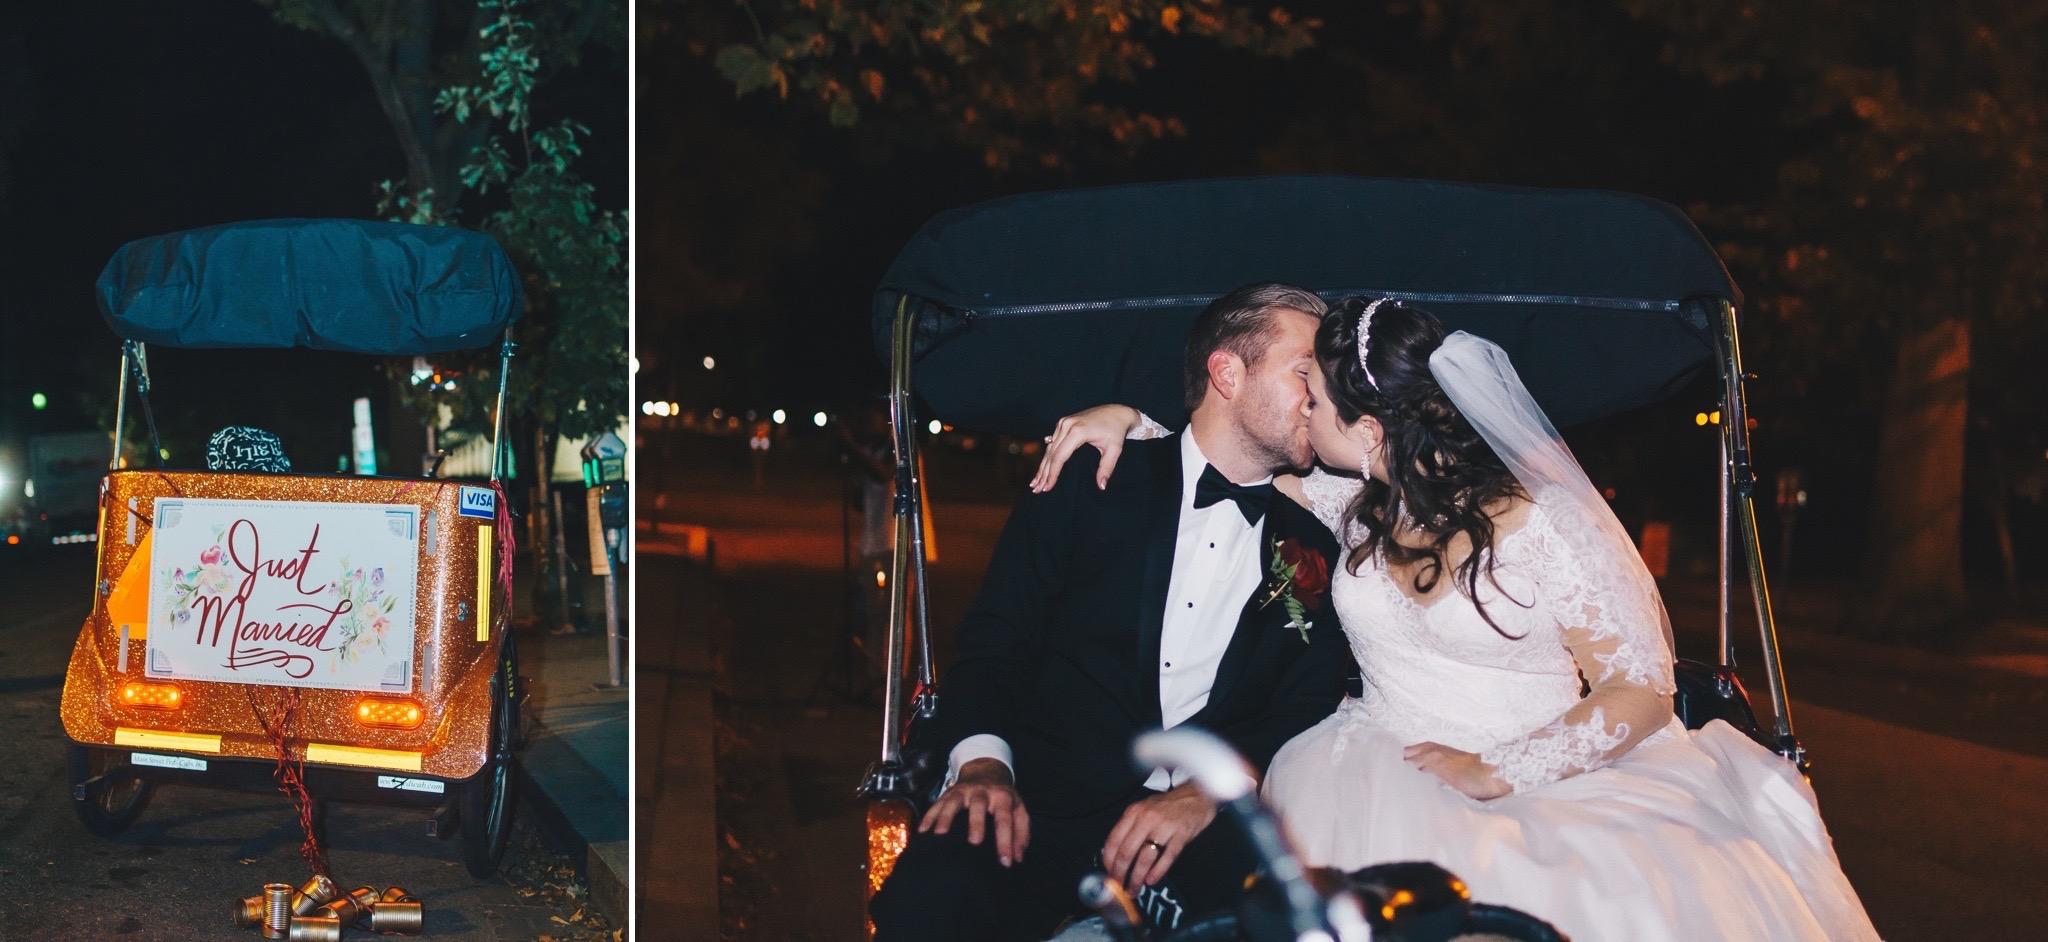 Nathan Elaina Romantic Capitol Wedding in Washington DC by Jonathan Hannah Photography18.jpg